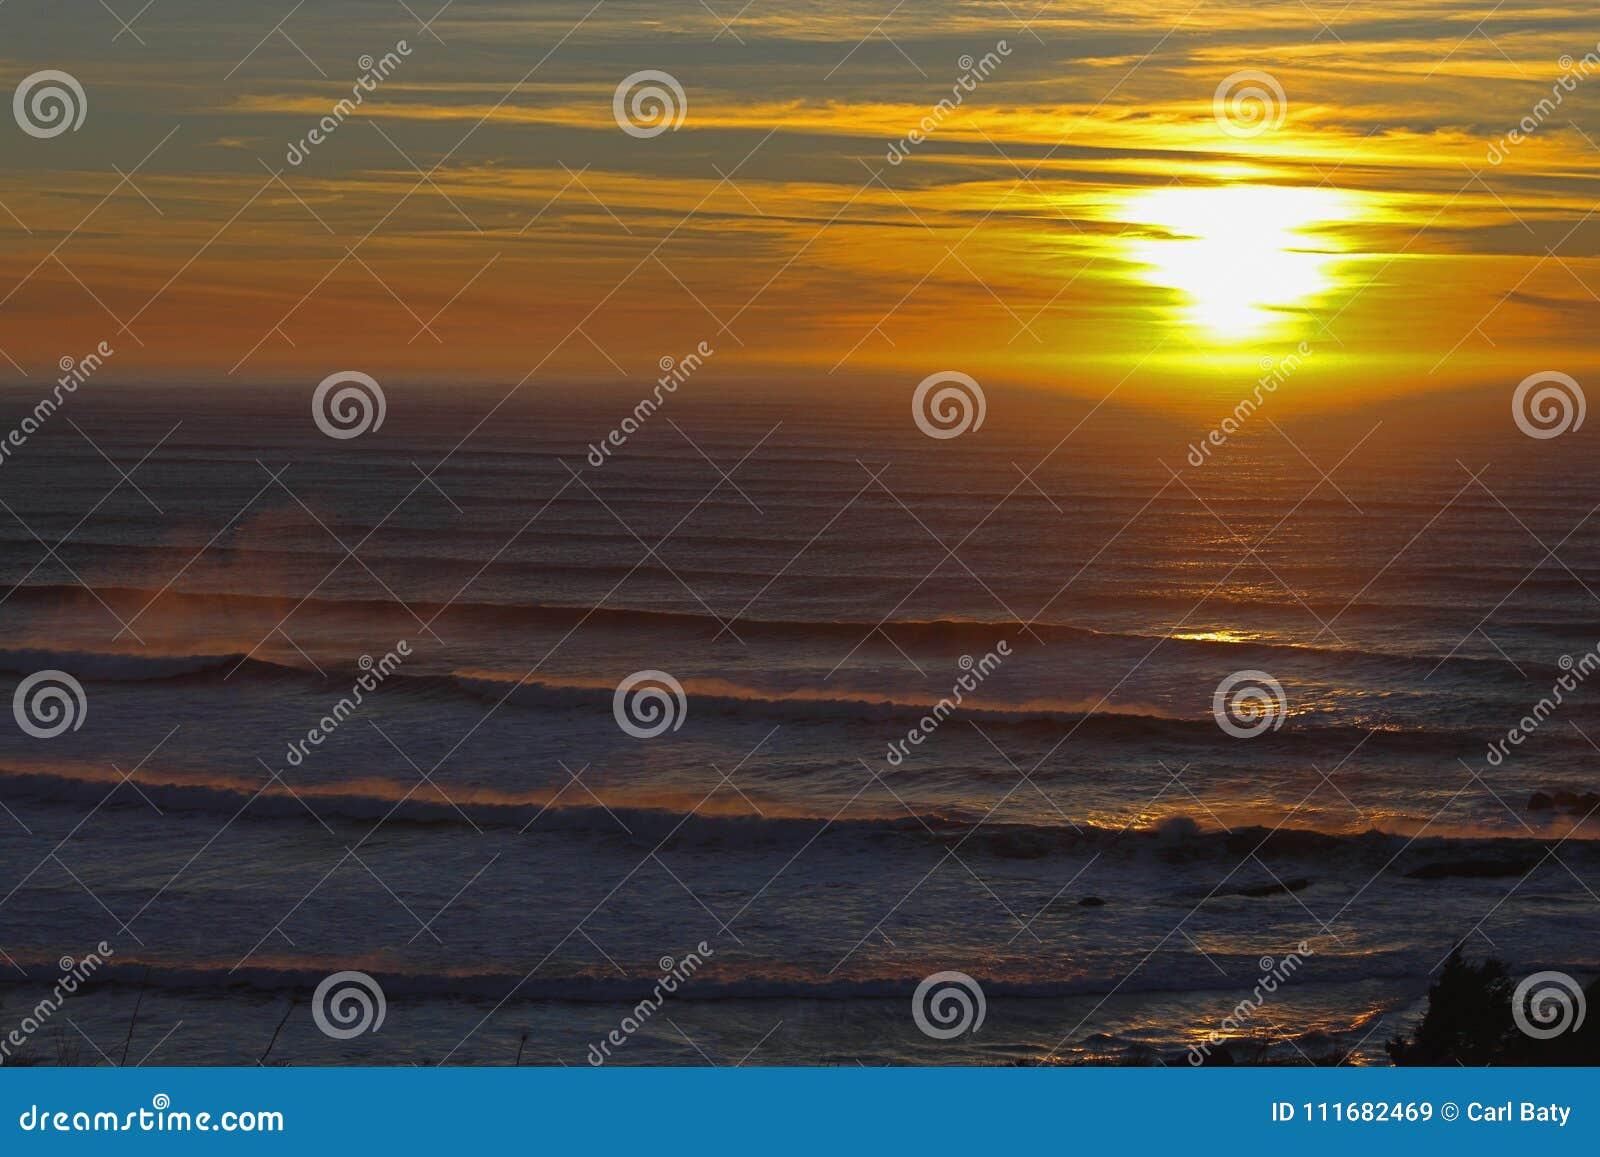 Oregon Sunset and Waves